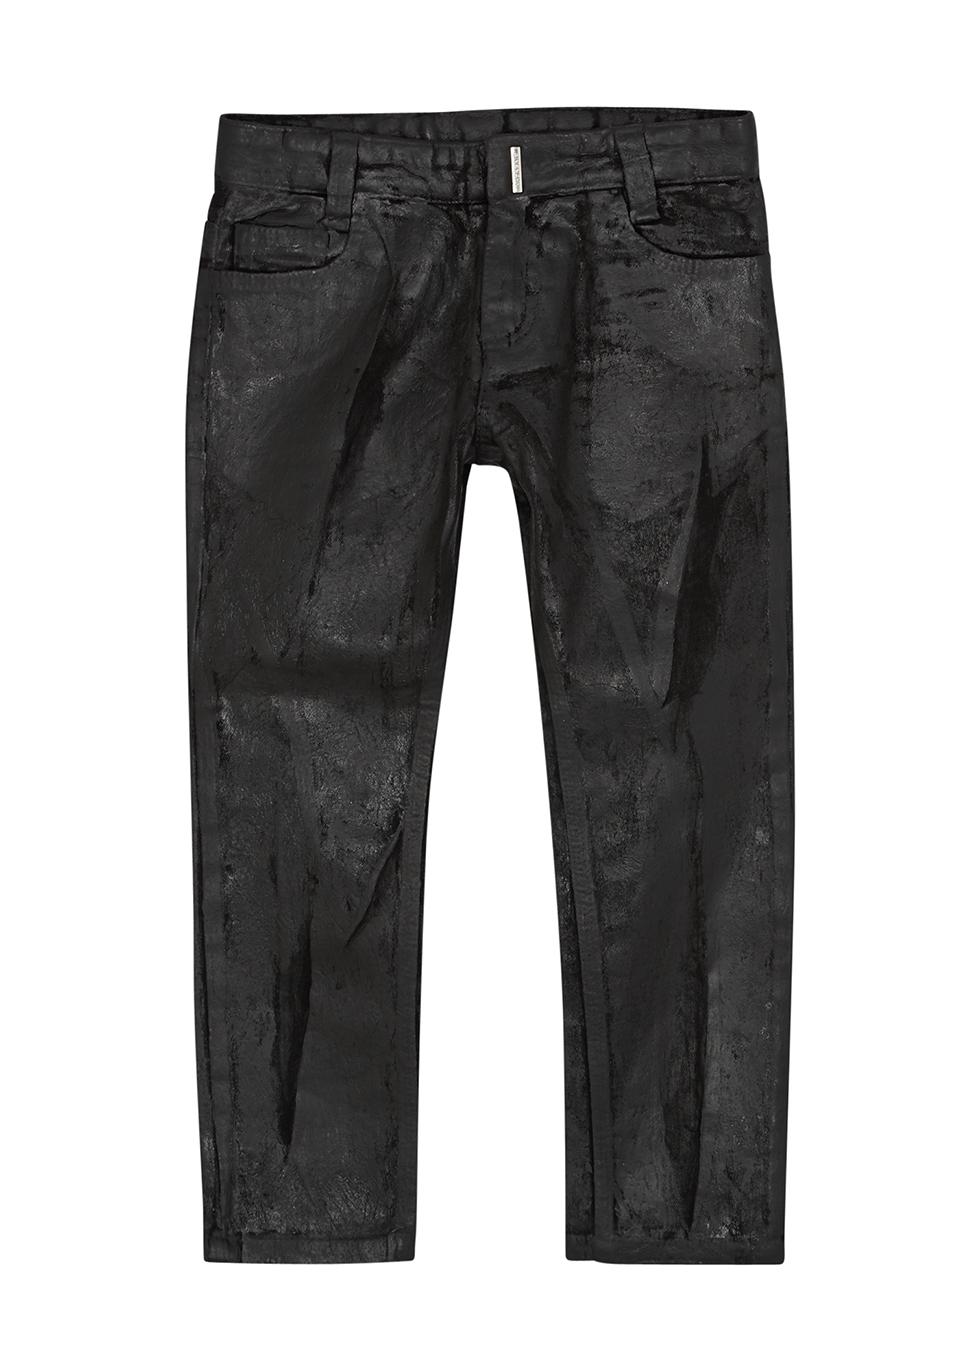 Black coated skinny jeans (4-5 years)